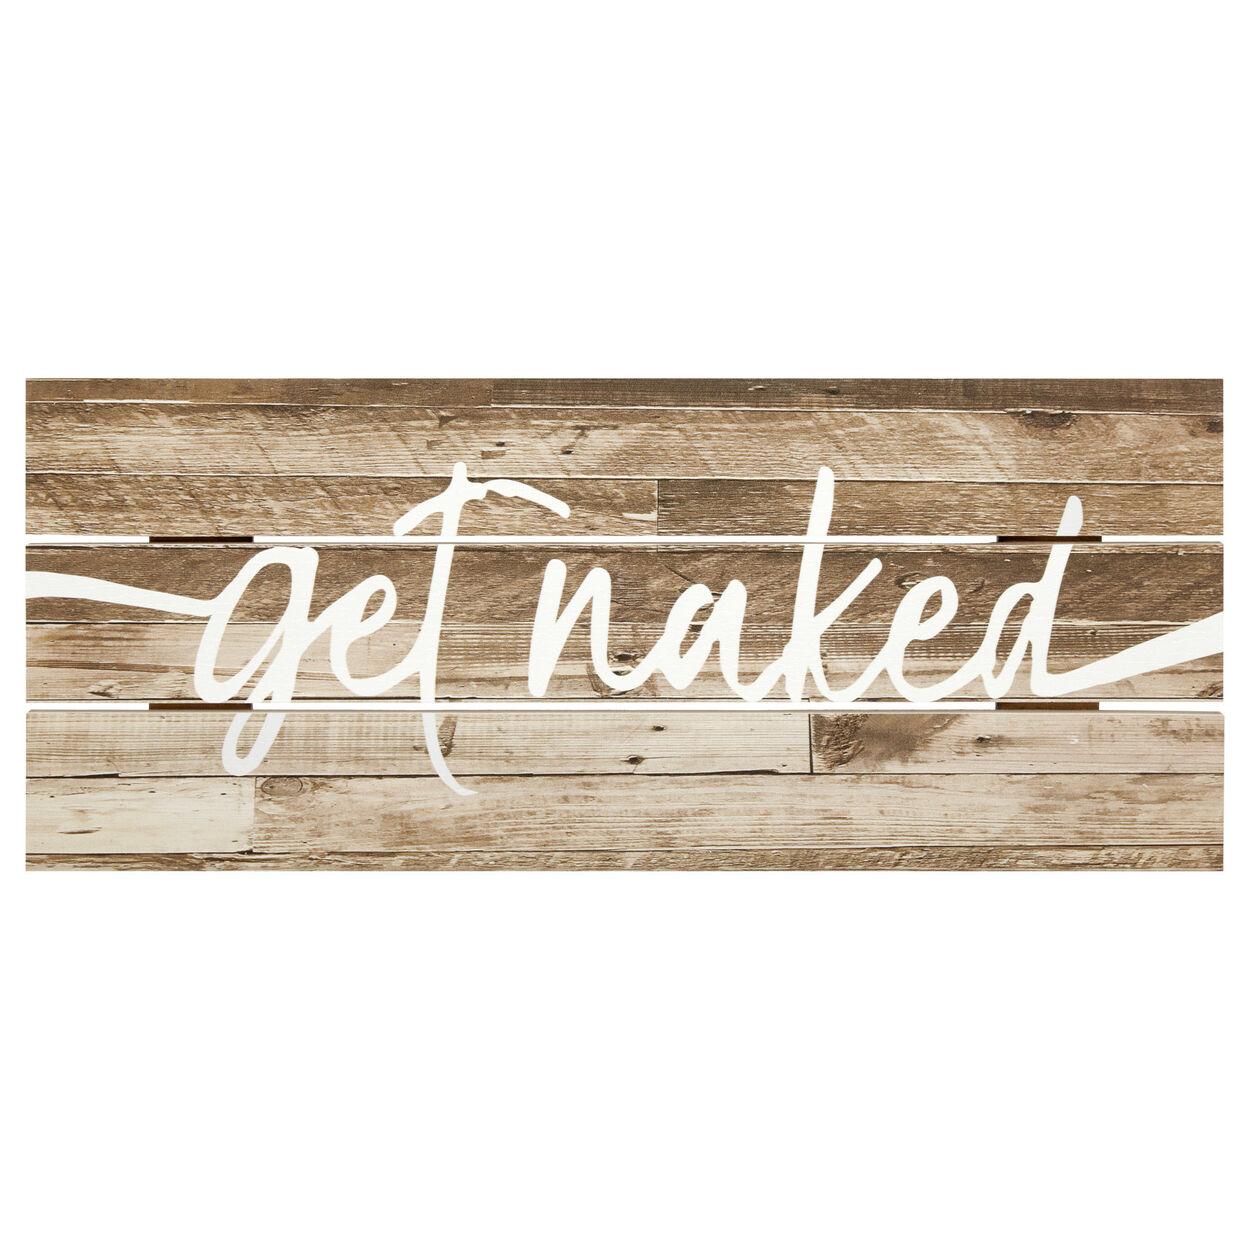 Get Naked Wood Wall Art